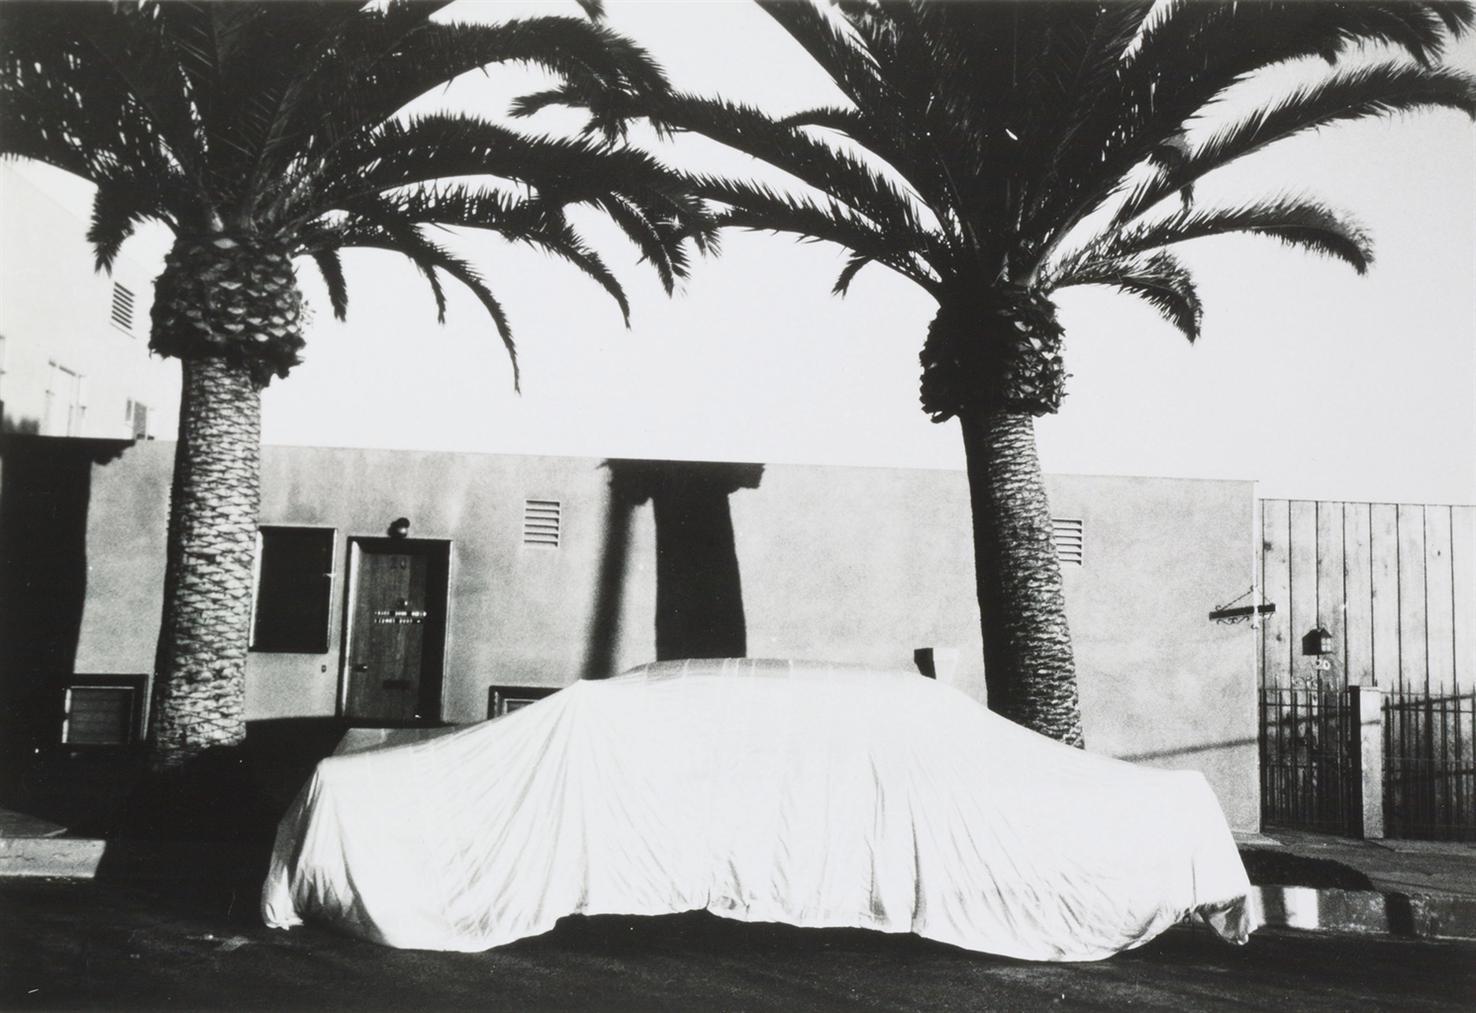 Robert Frank-Covered Car, Long Beach, California-1956